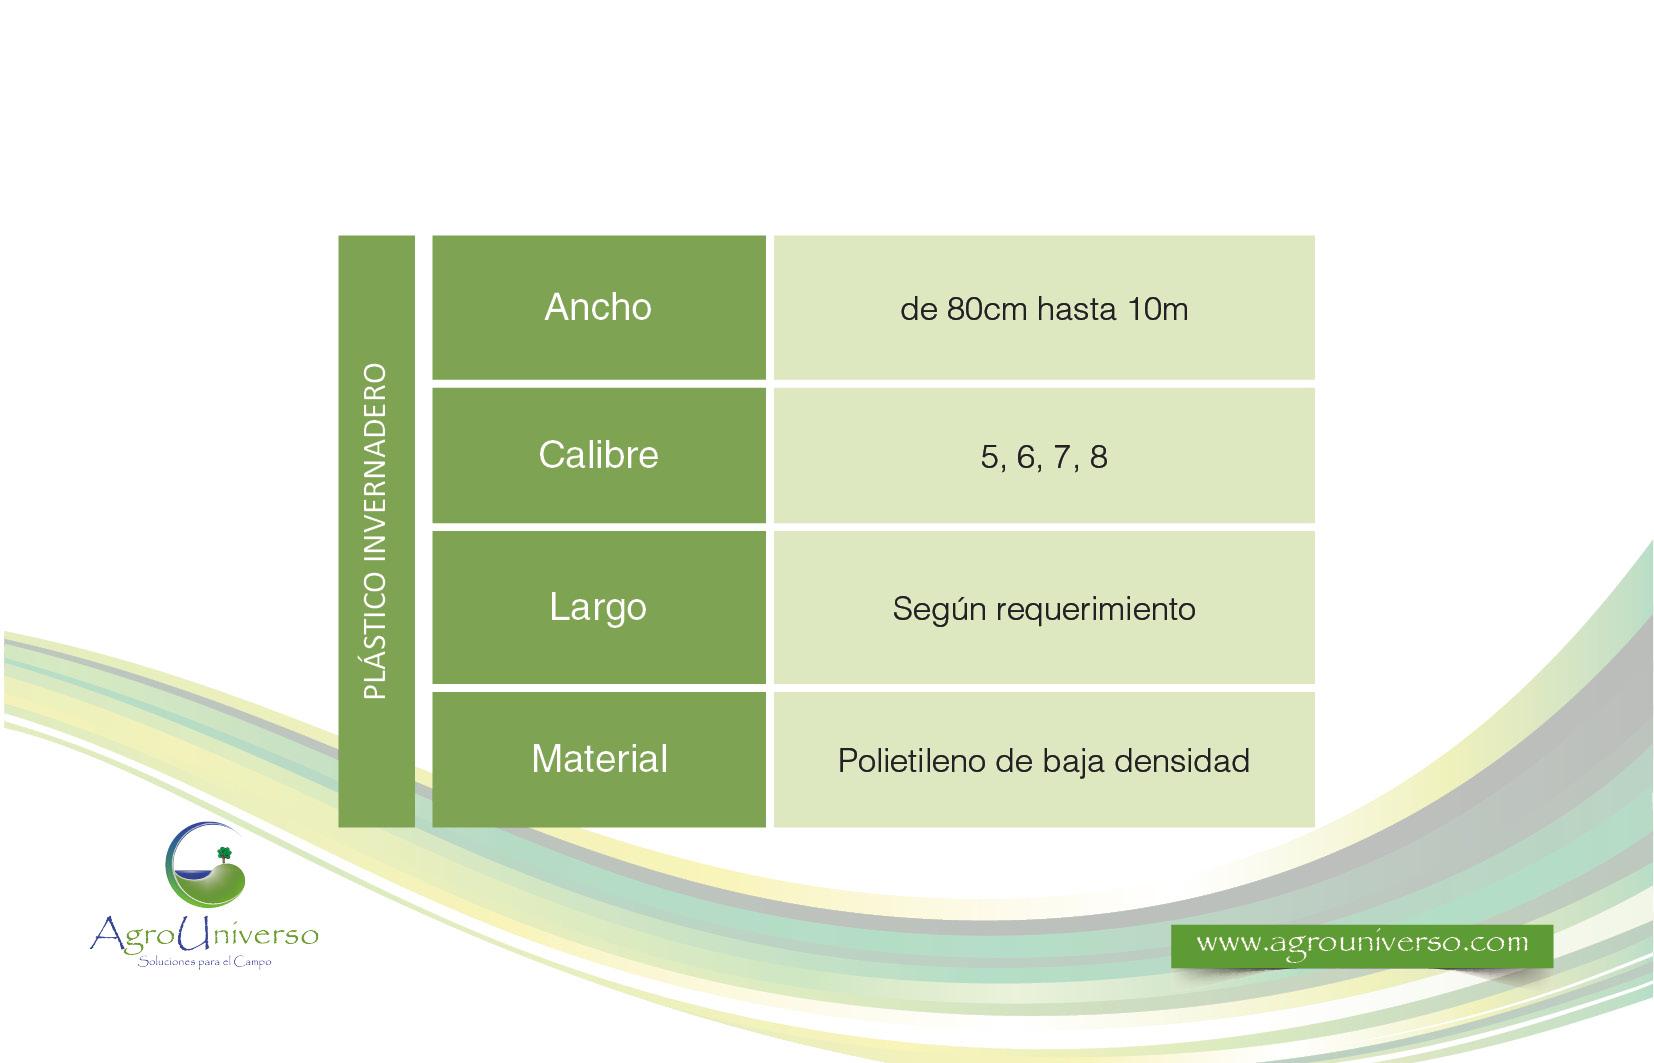 Catlogo-de-productos-Agrouniverso-15